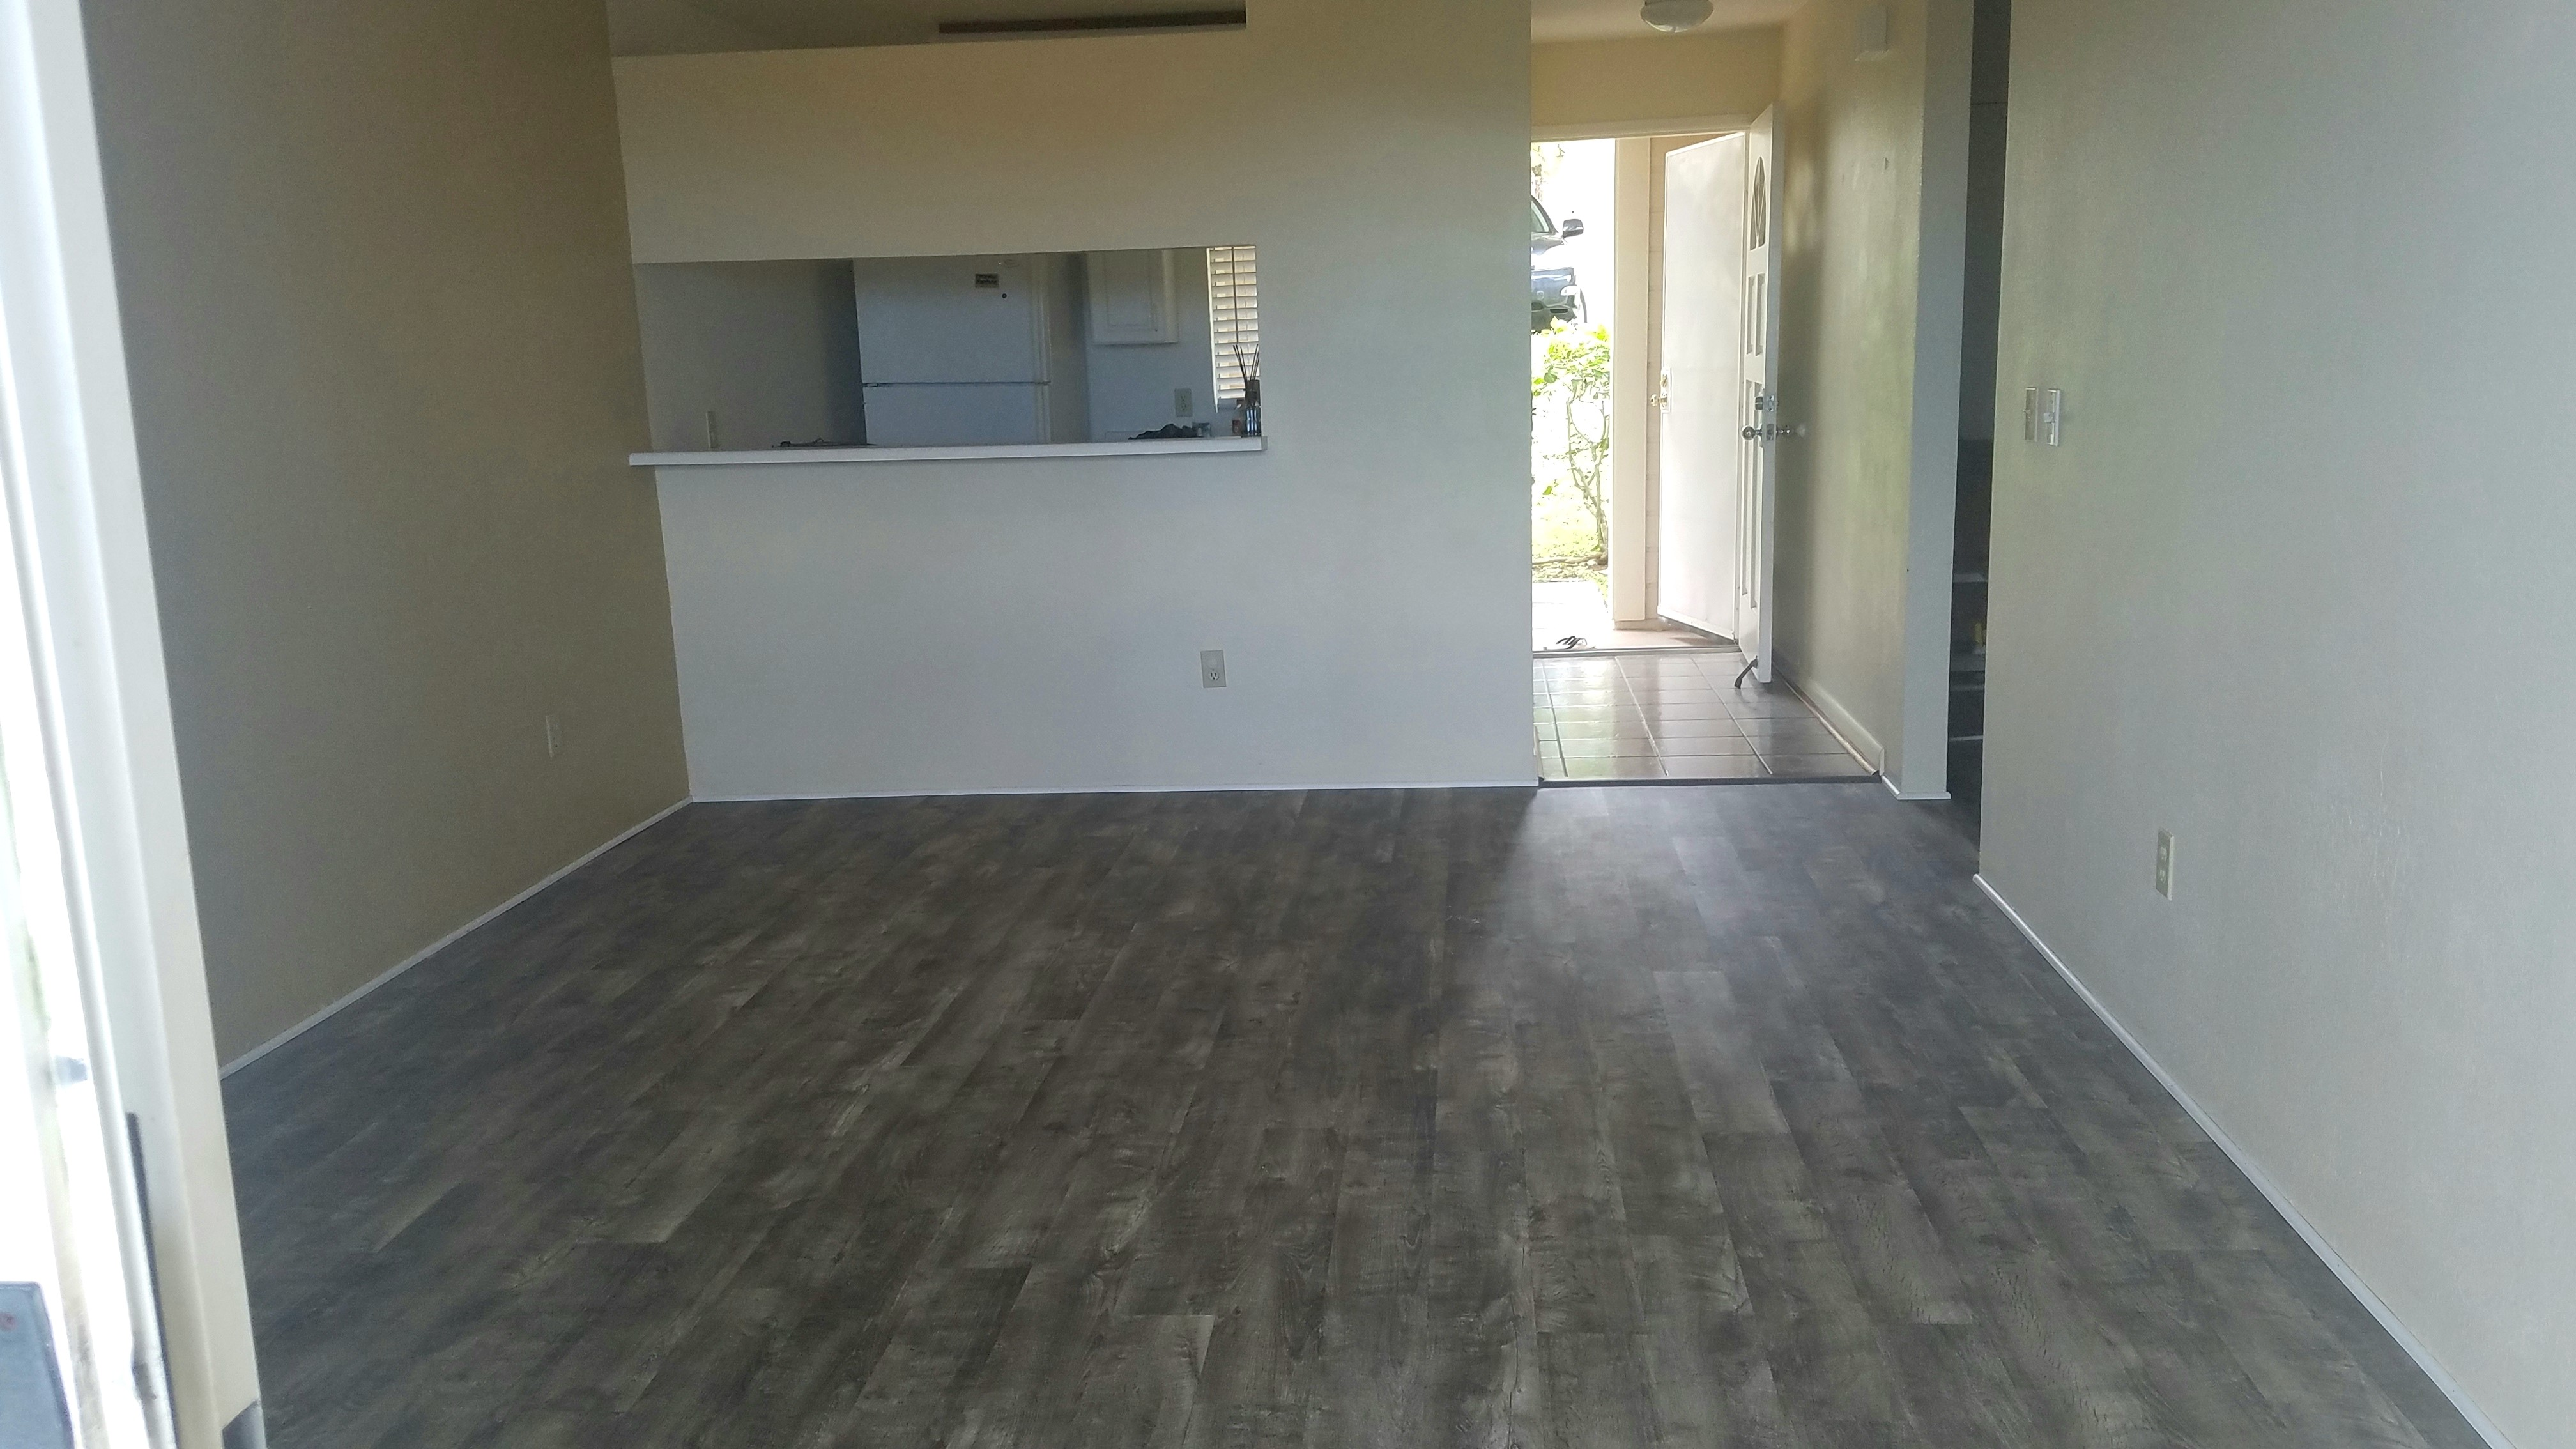 Palahia livingroom use